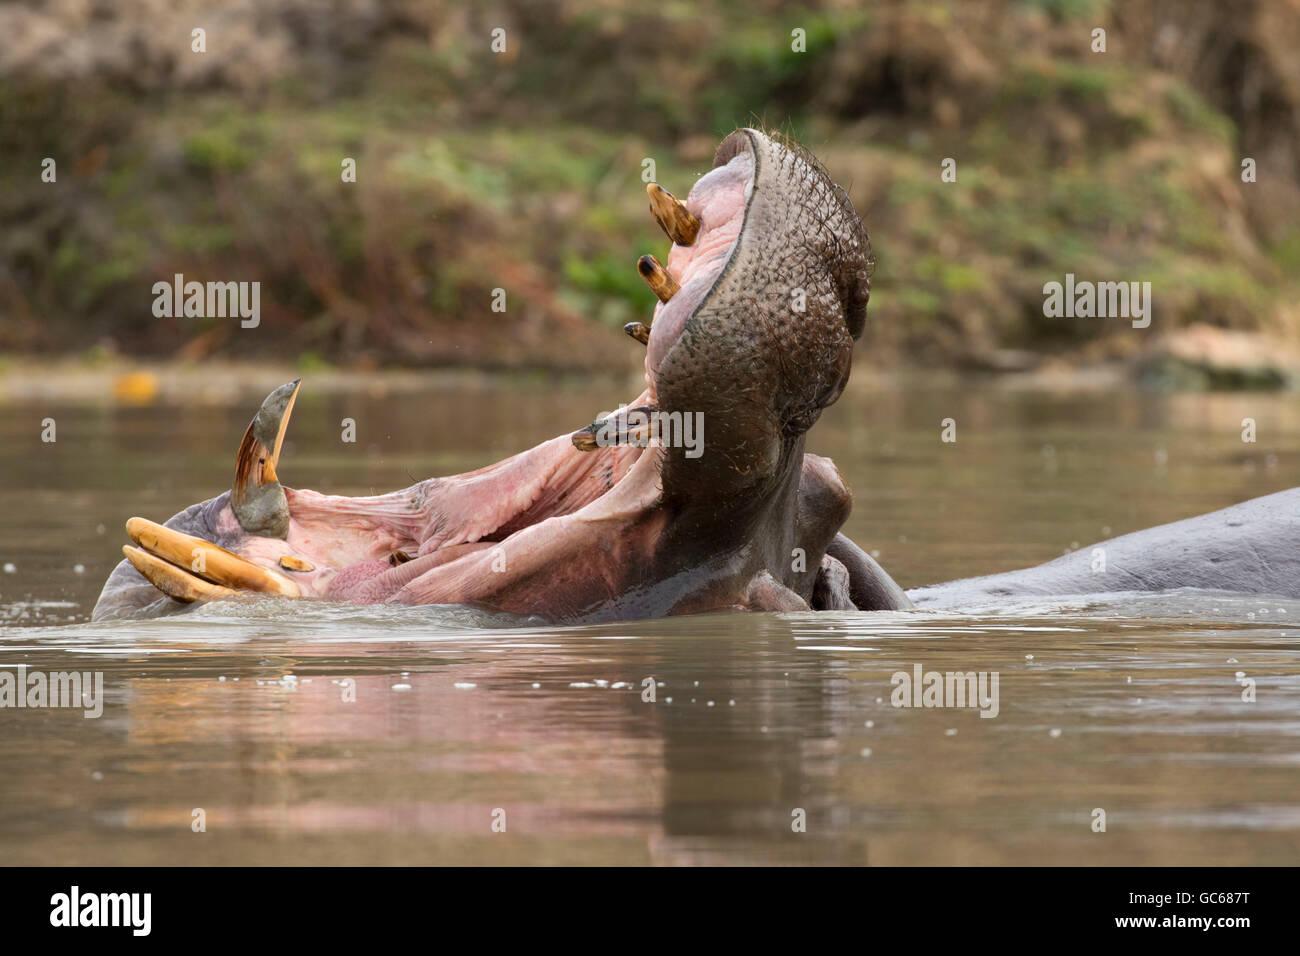 Ippopotamo (Hippopotamus amphibius), Wildlife Safari, Winston, Oregon Immagini Stock